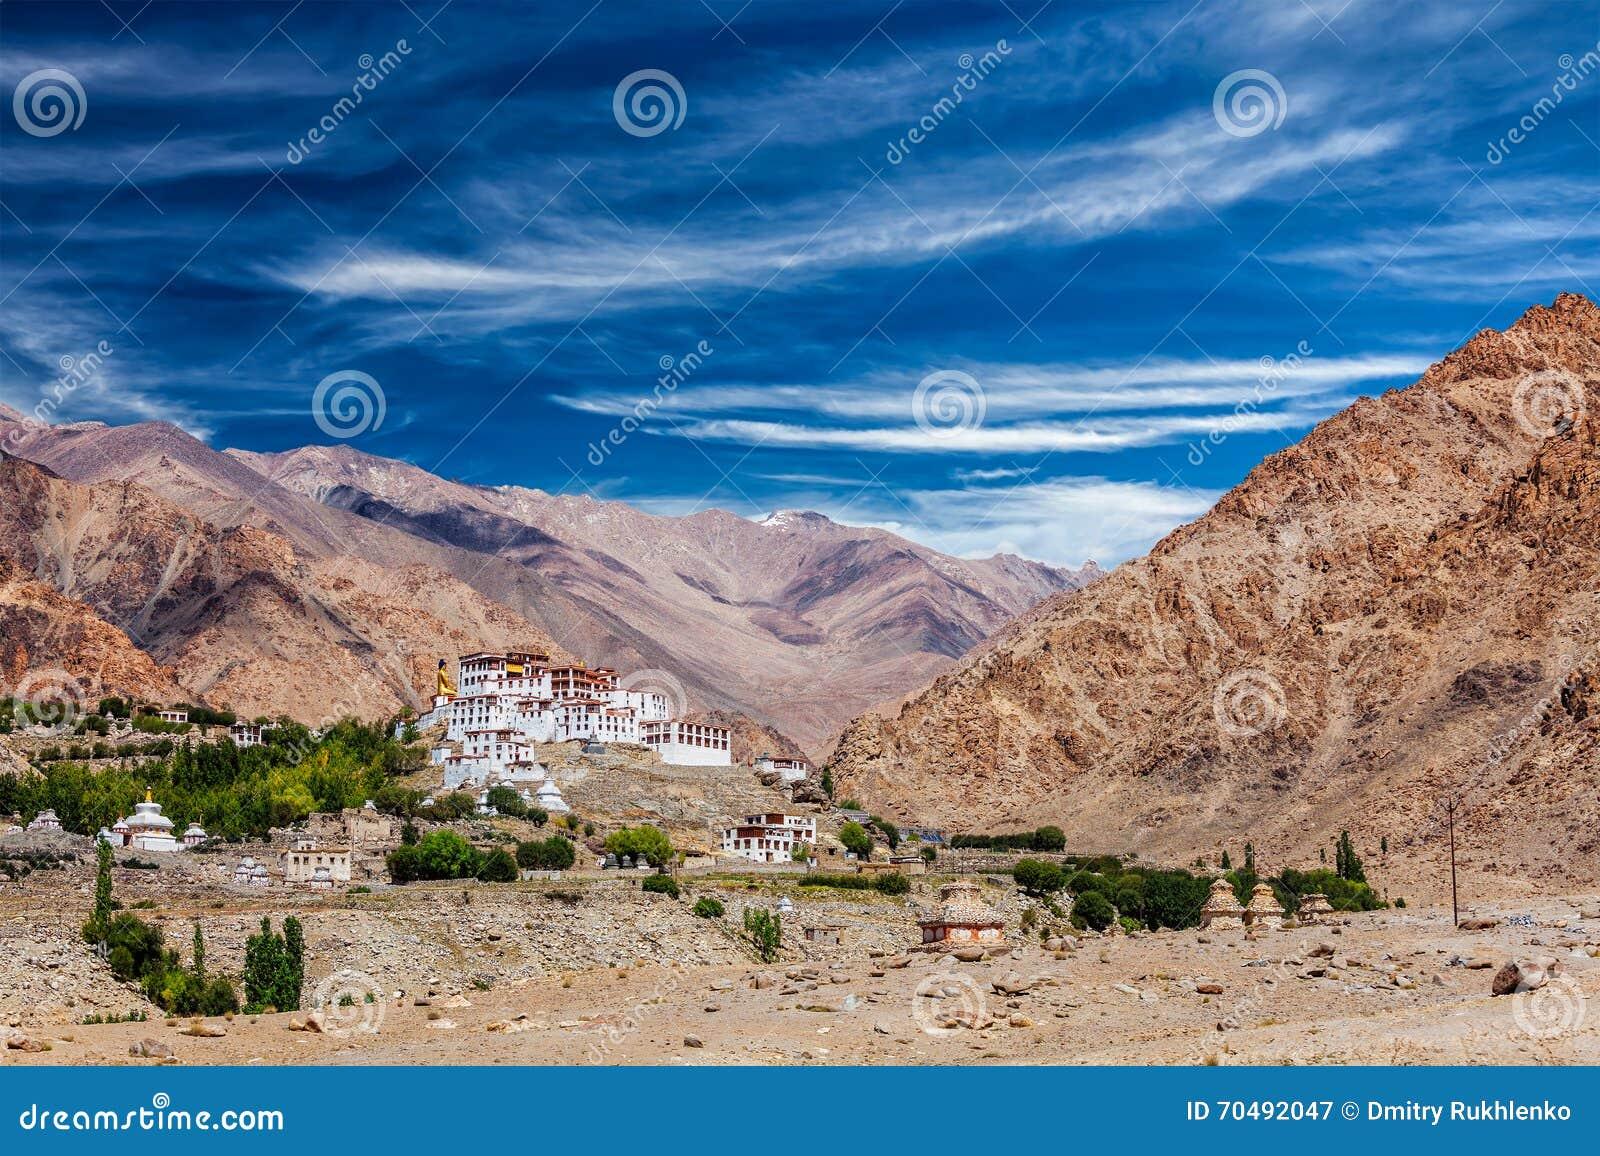 Монастырь Likir Gompa тибетский буддийский в Гималаях